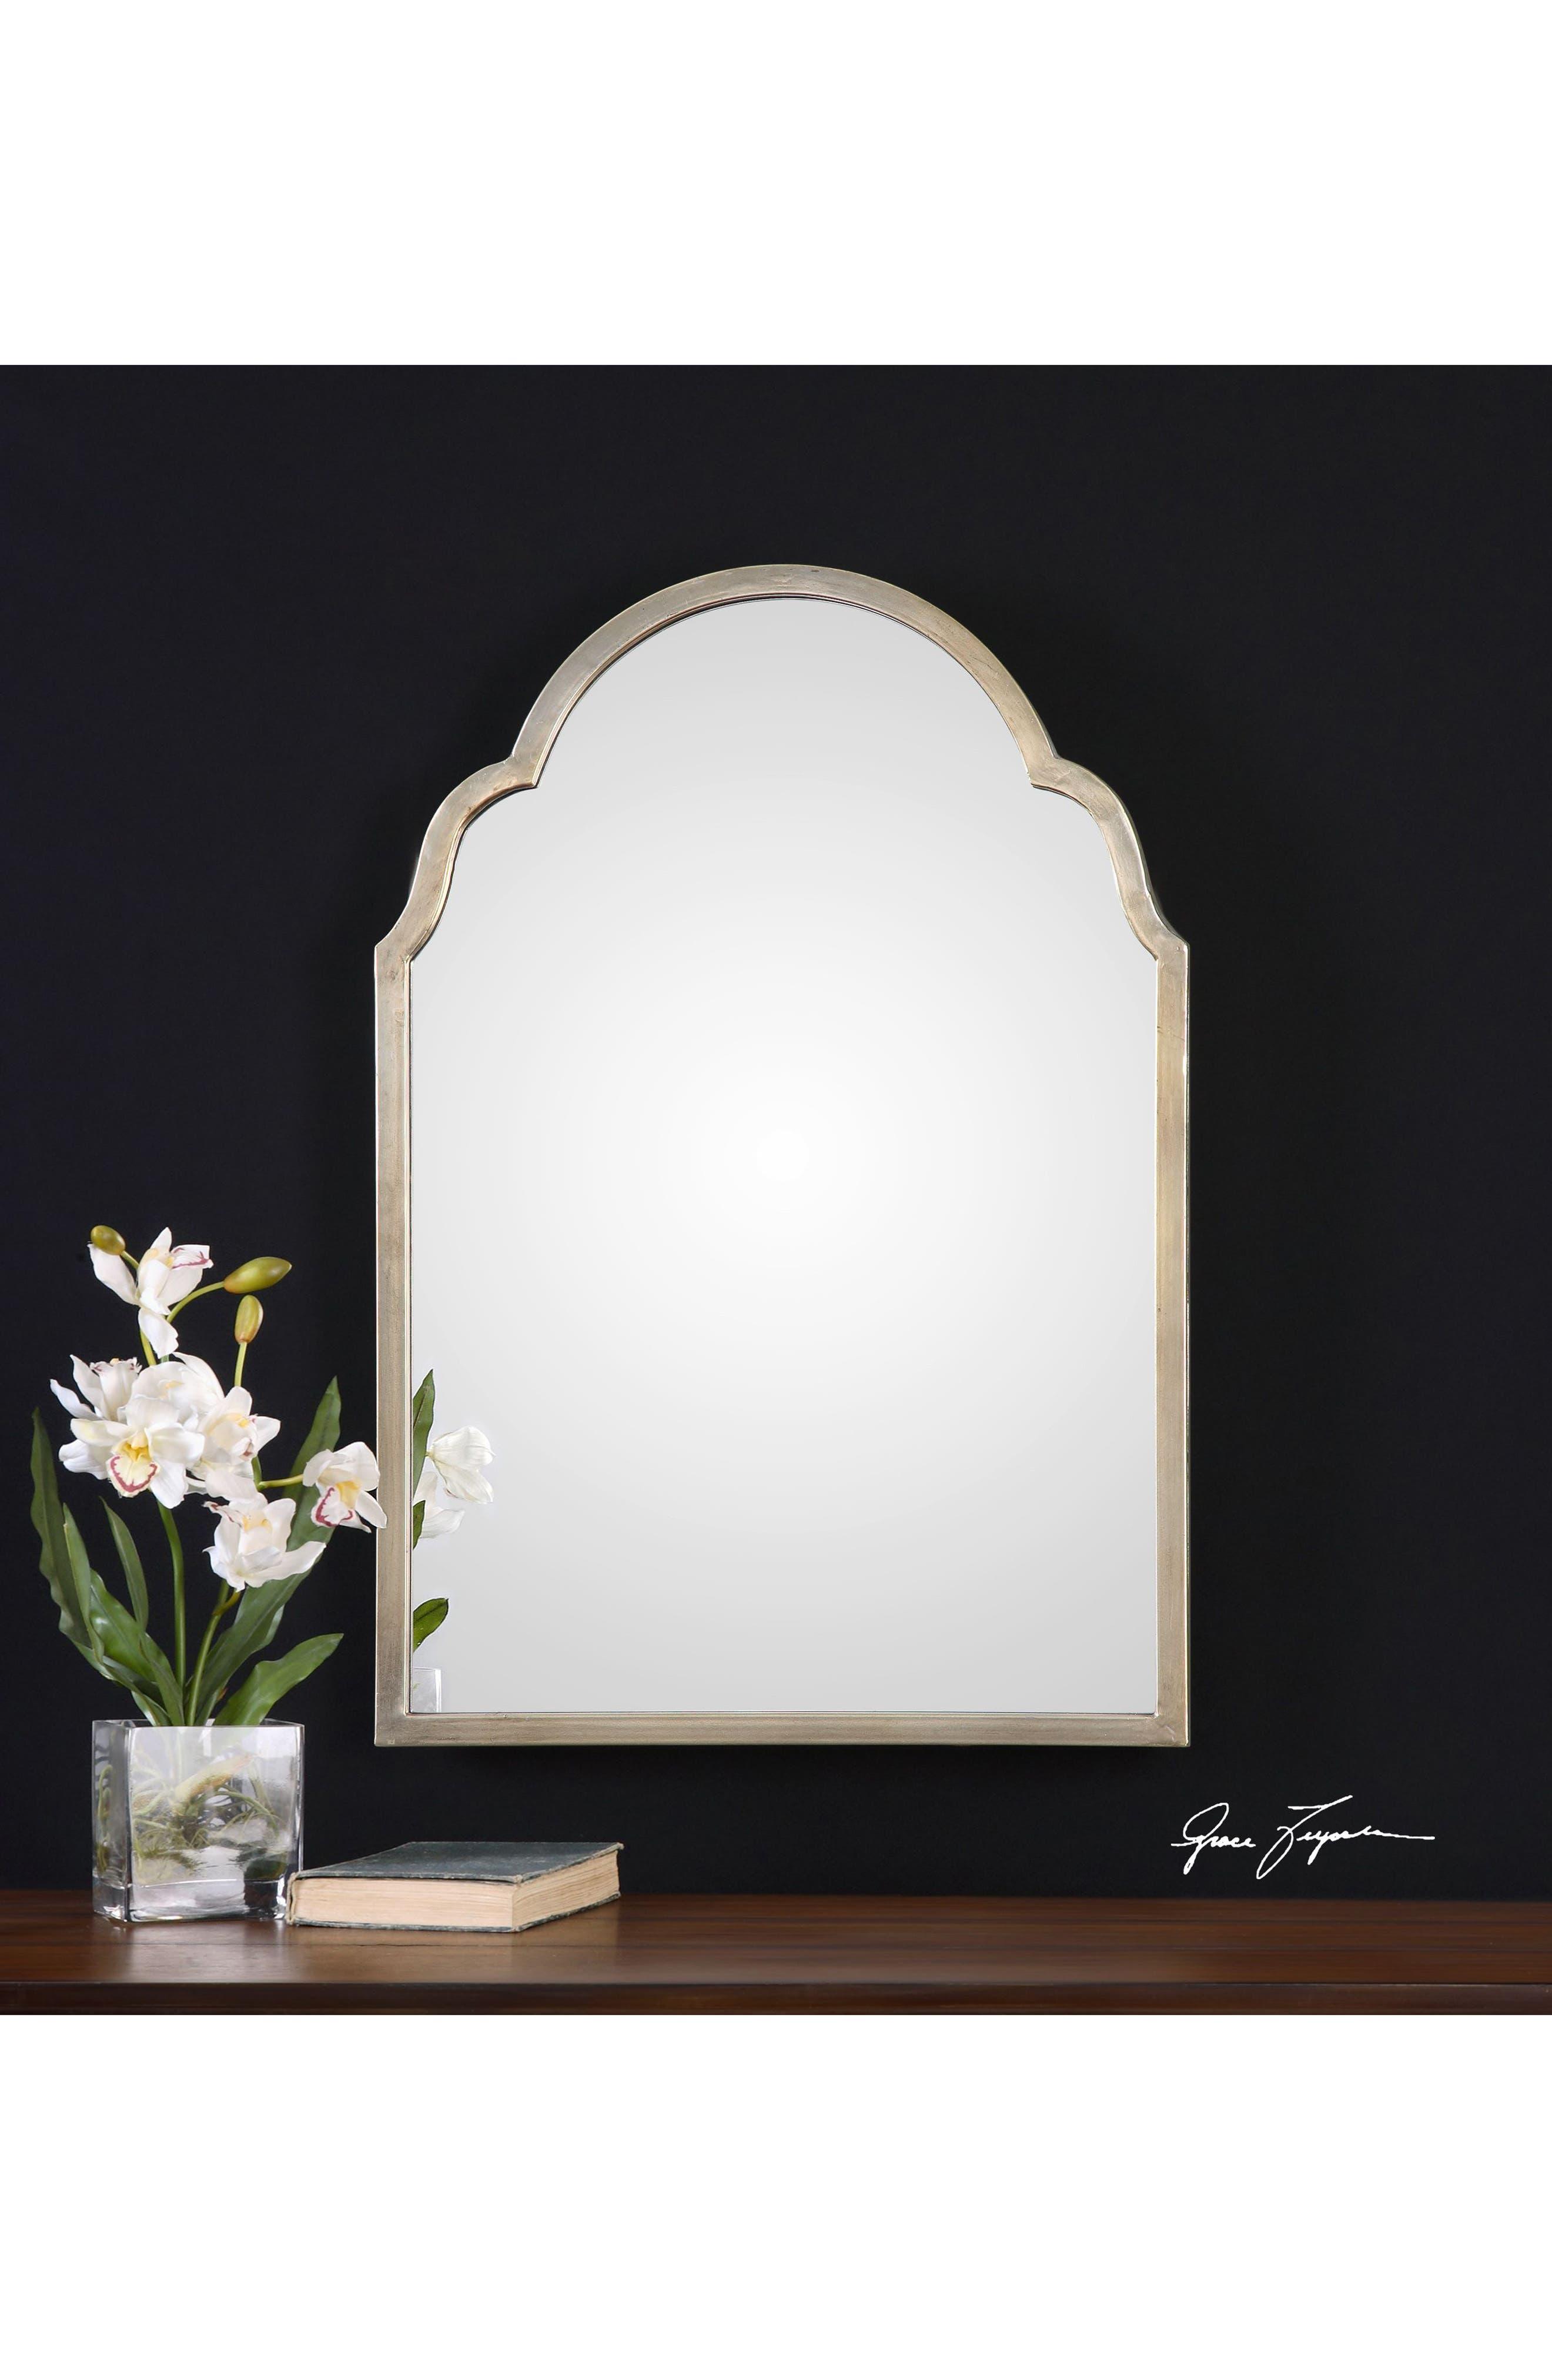 Brayden Small Arch Mirror,                             Alternate thumbnail 2, color,                             040